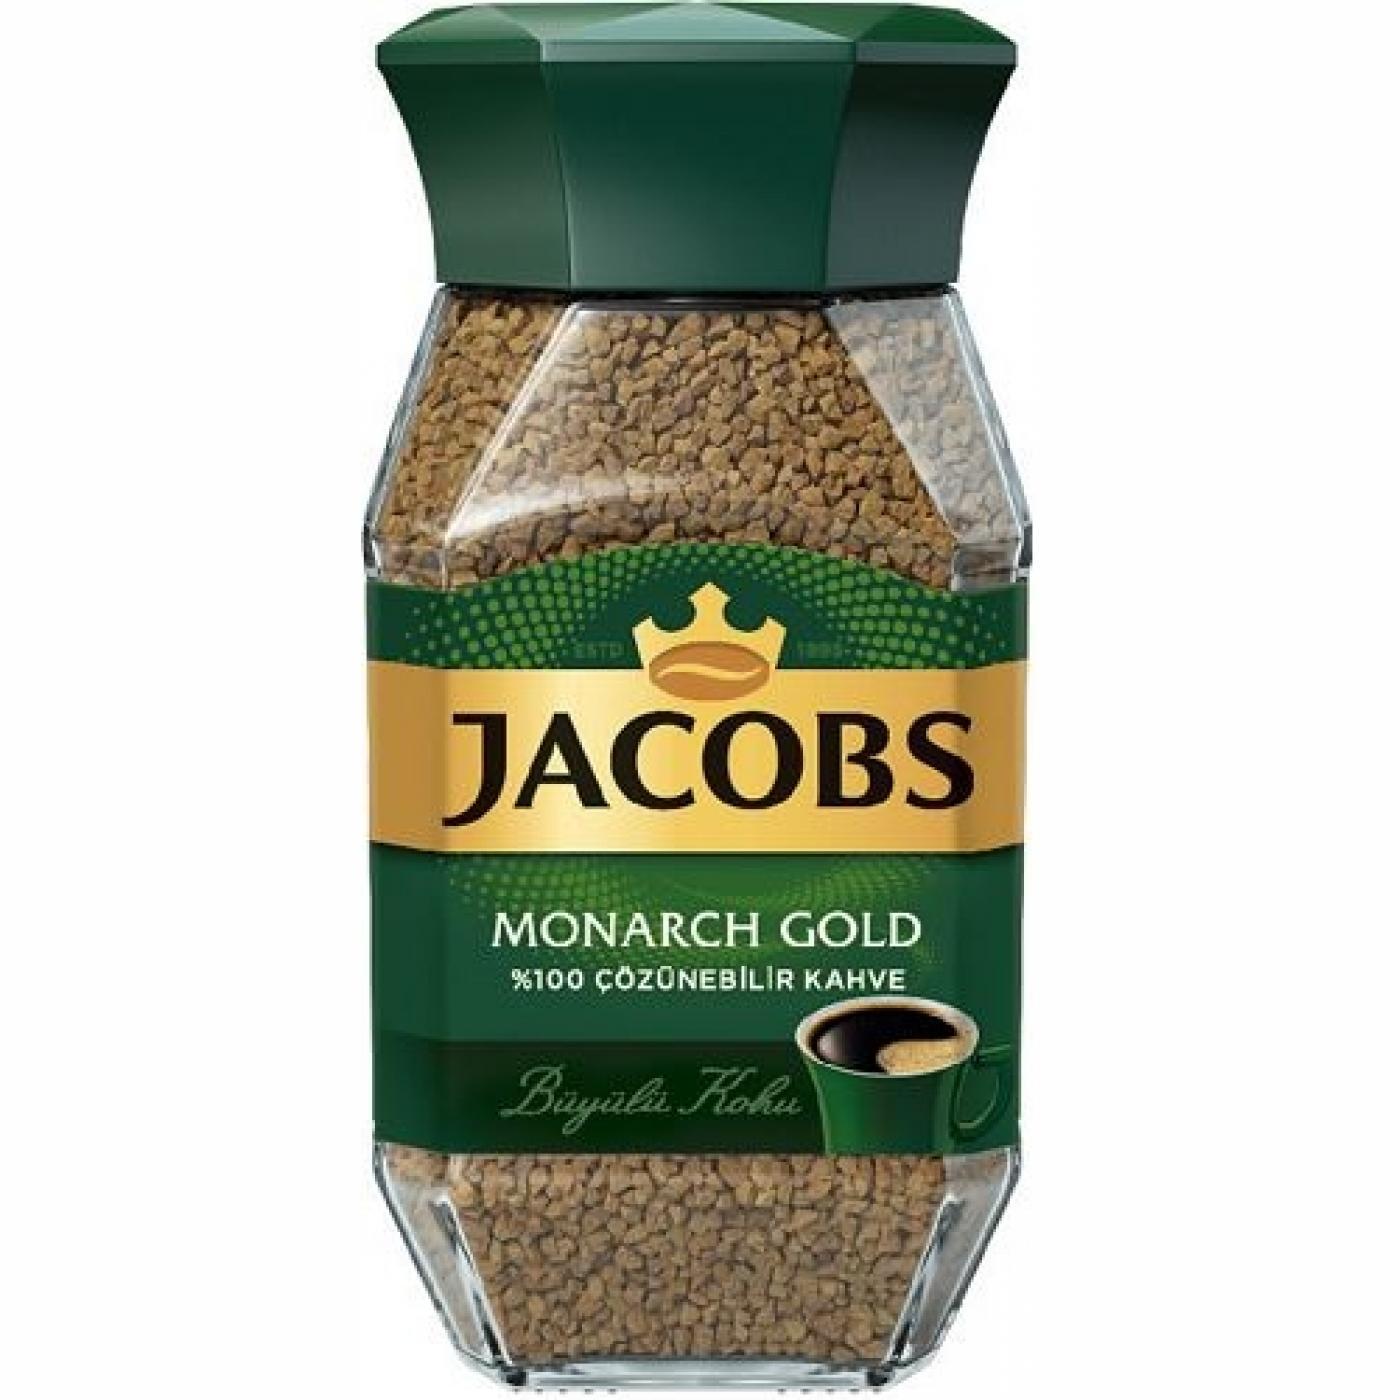 JACOBS MONARCH GOLD KAVANOZ 100GR